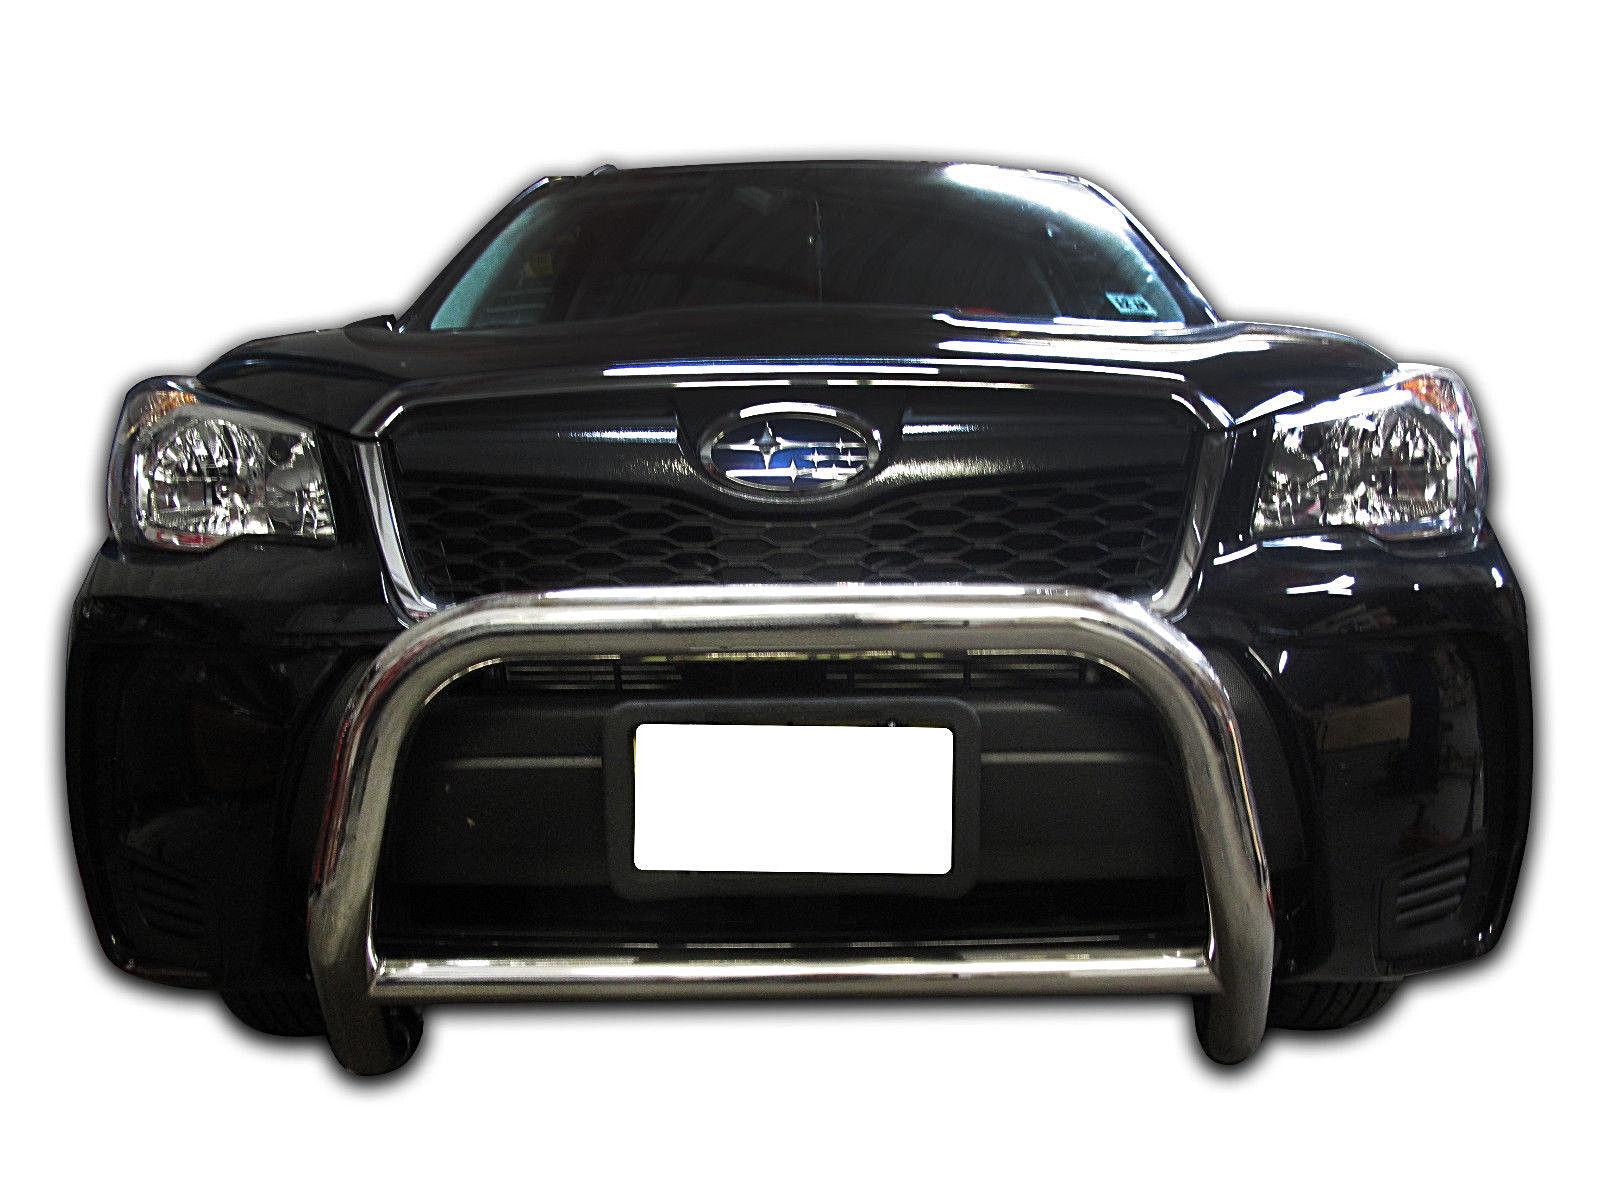 WynnTech Rear Bumper Protector Guard Single Pipe Fits: Nissan Rogue 2008-2013